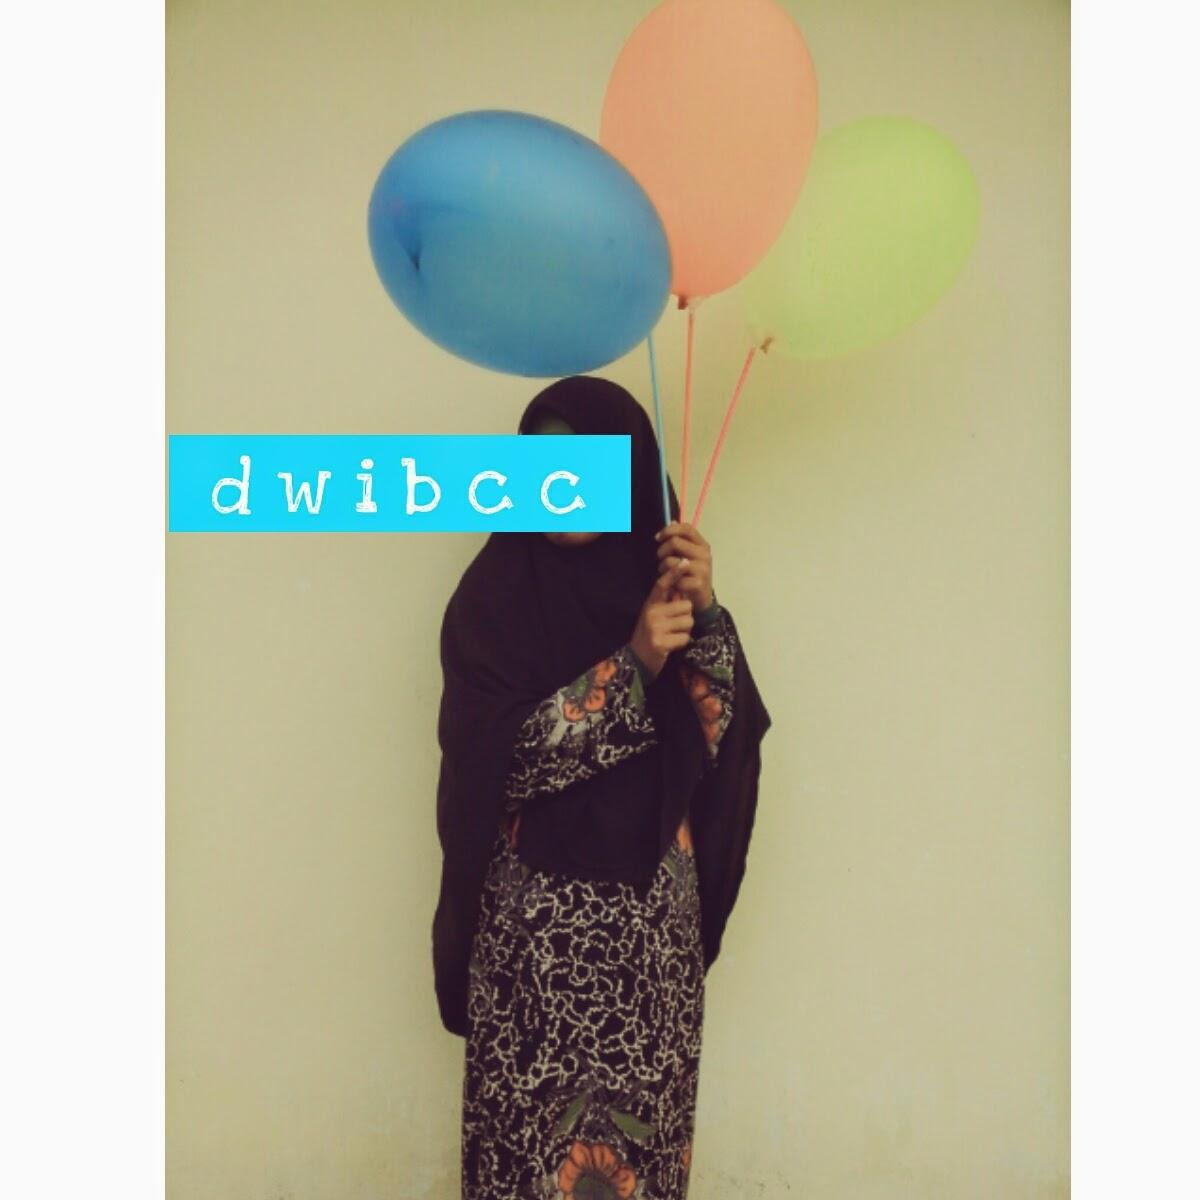 foto dwibcc muslimah denga balon